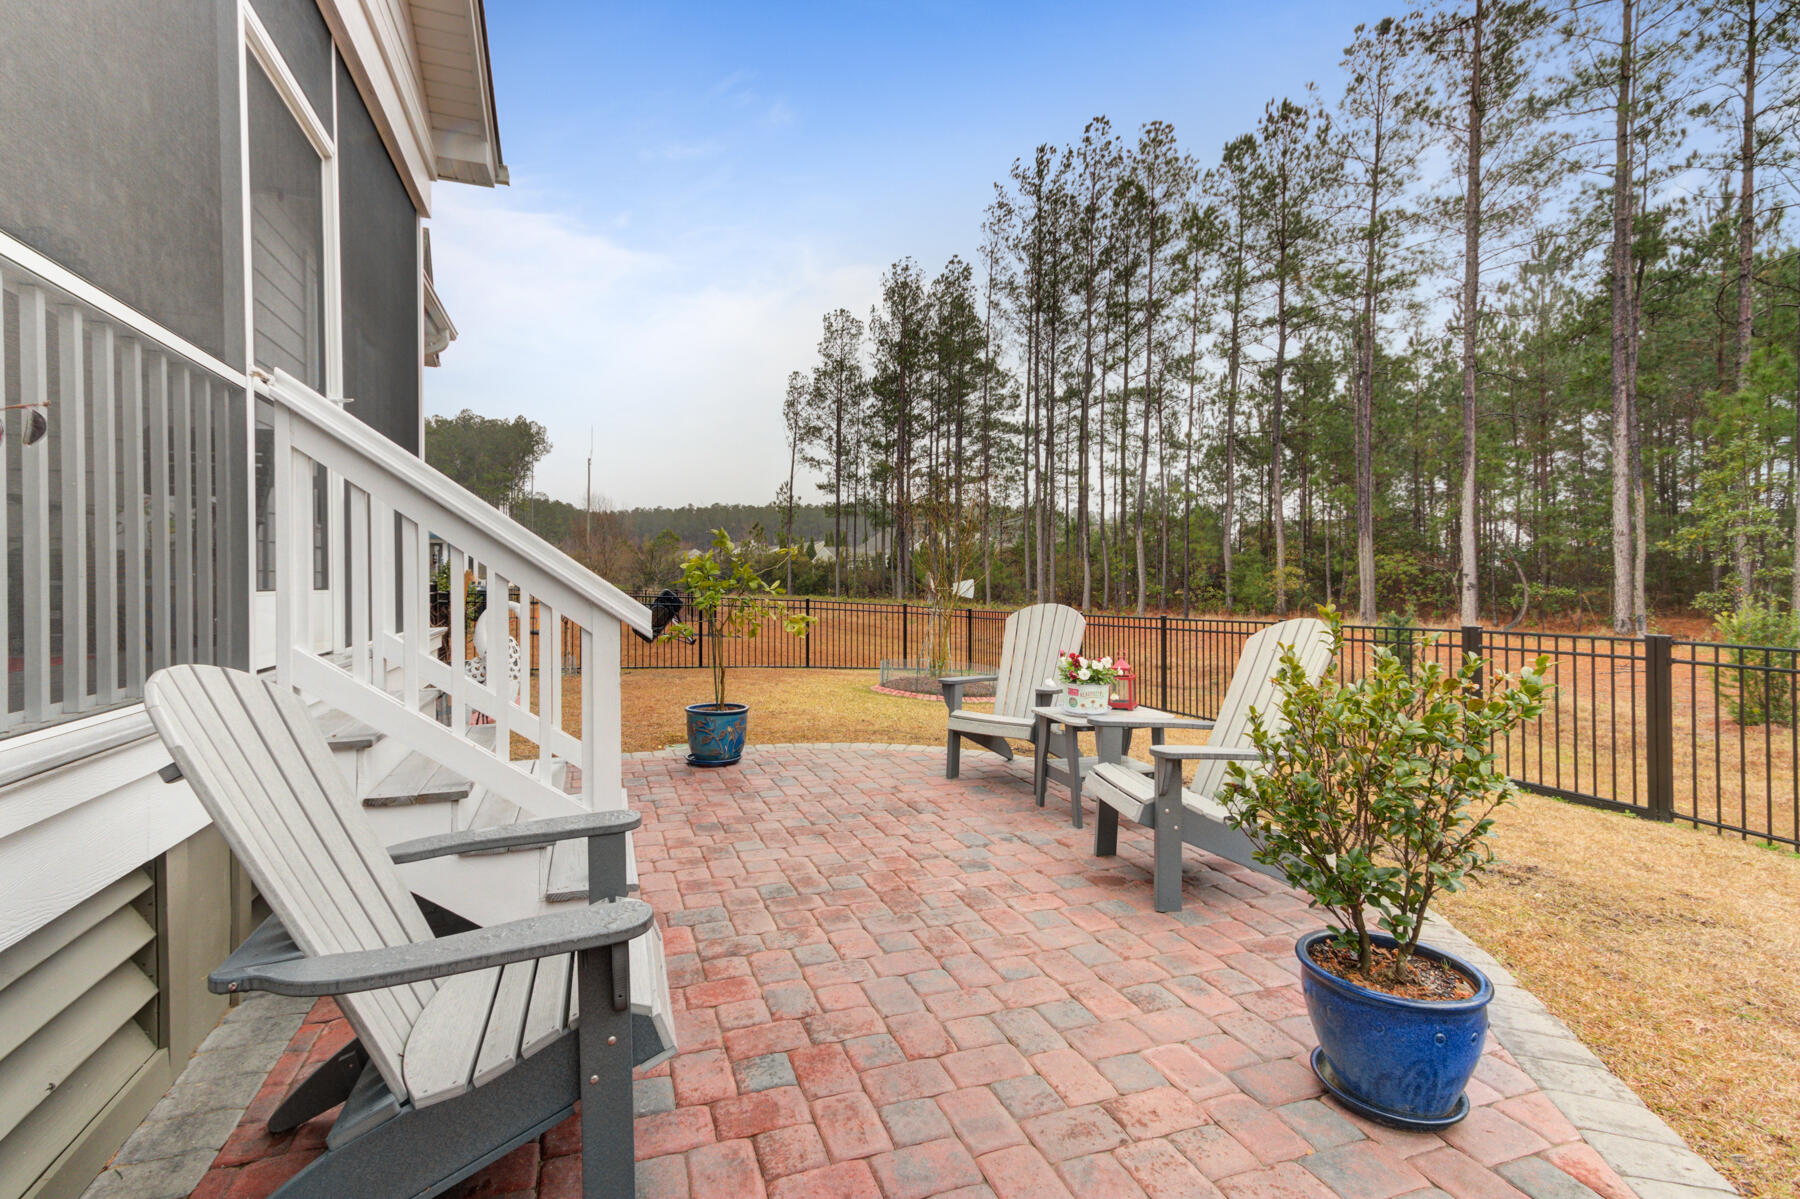 Cane Bay Plantation Homes For Sale - 251 Calm Water, Summerville, SC - 19